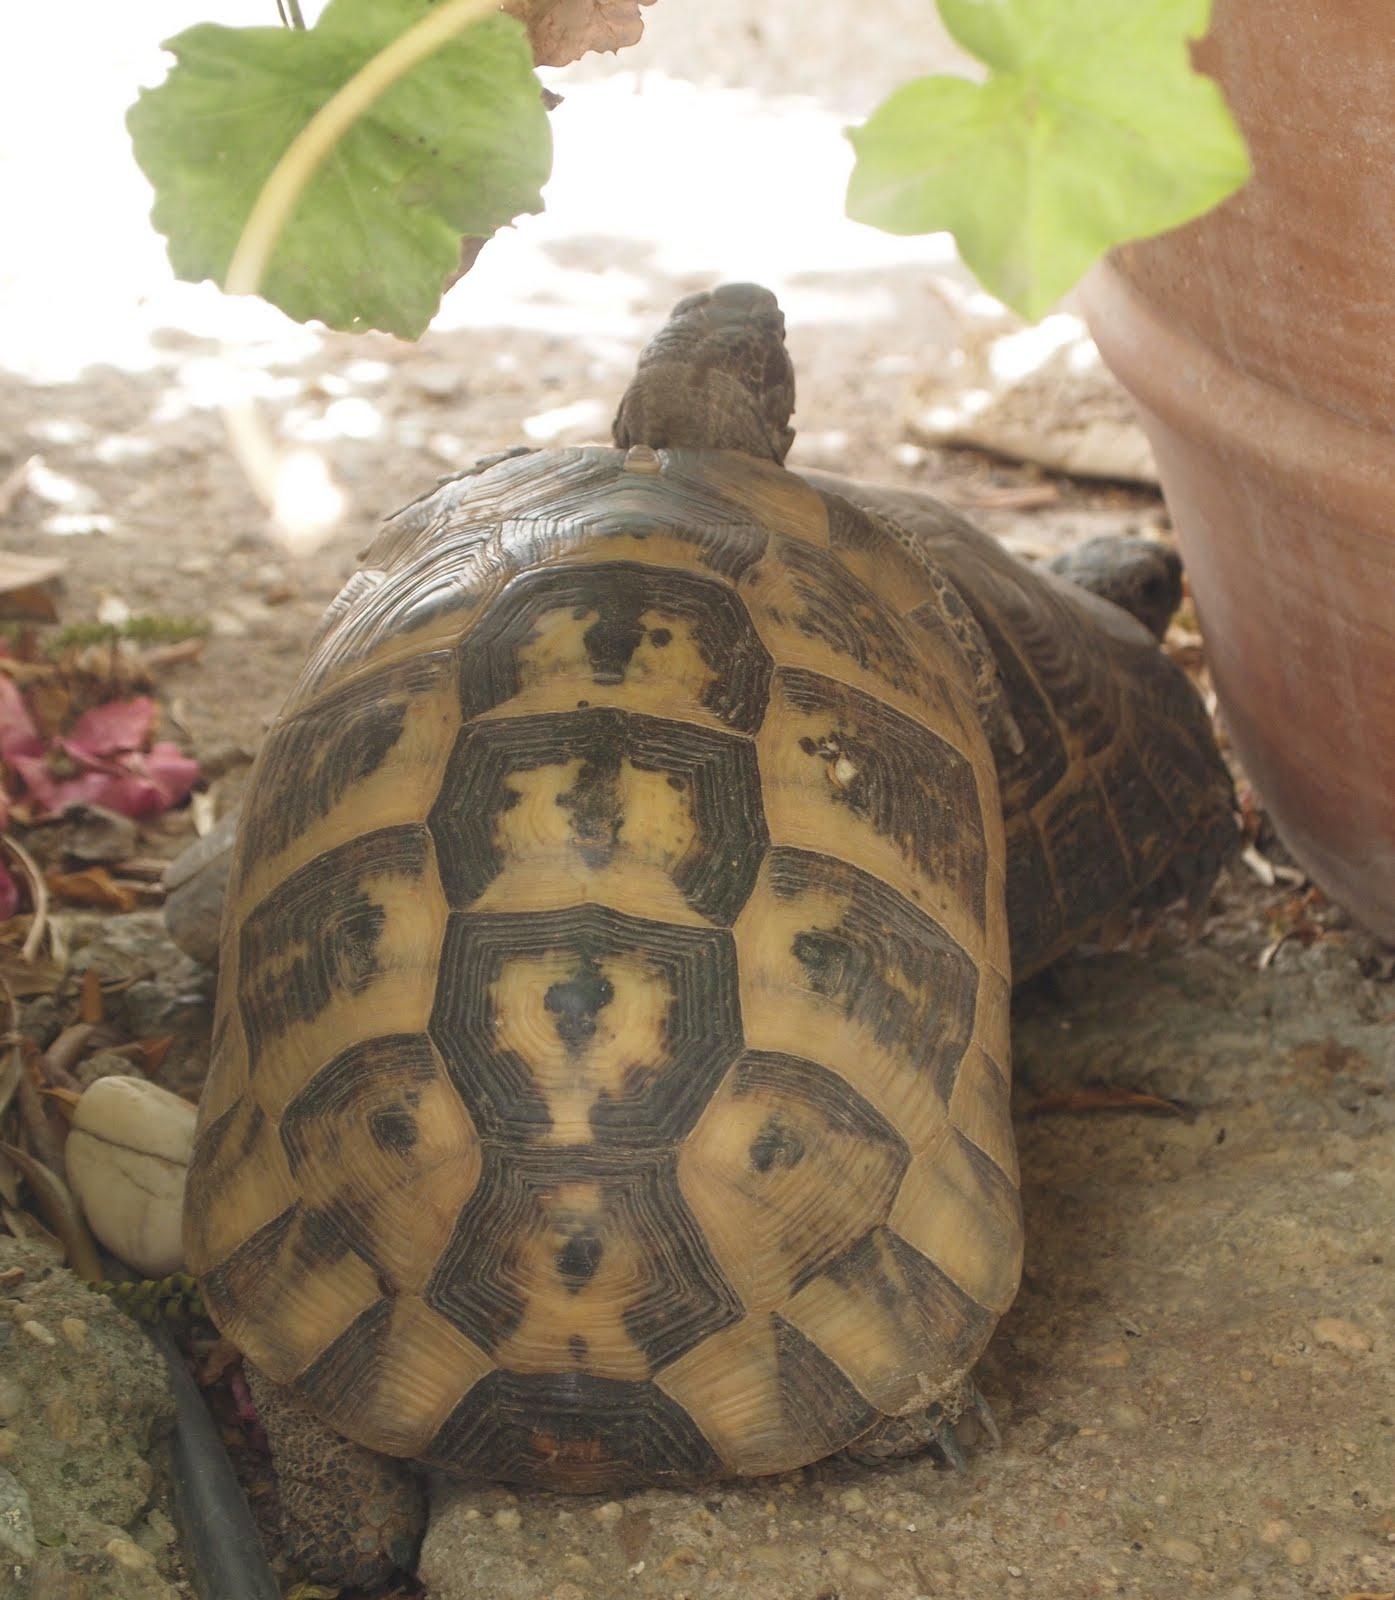 http://2.bp.blogspot.com/-EW88iMbdup0/TlwFdvfHEmI/AAAAAAAABbA/sMZxOwN1vG8/s1600/Tortoise+doing+the+naughty.jpg